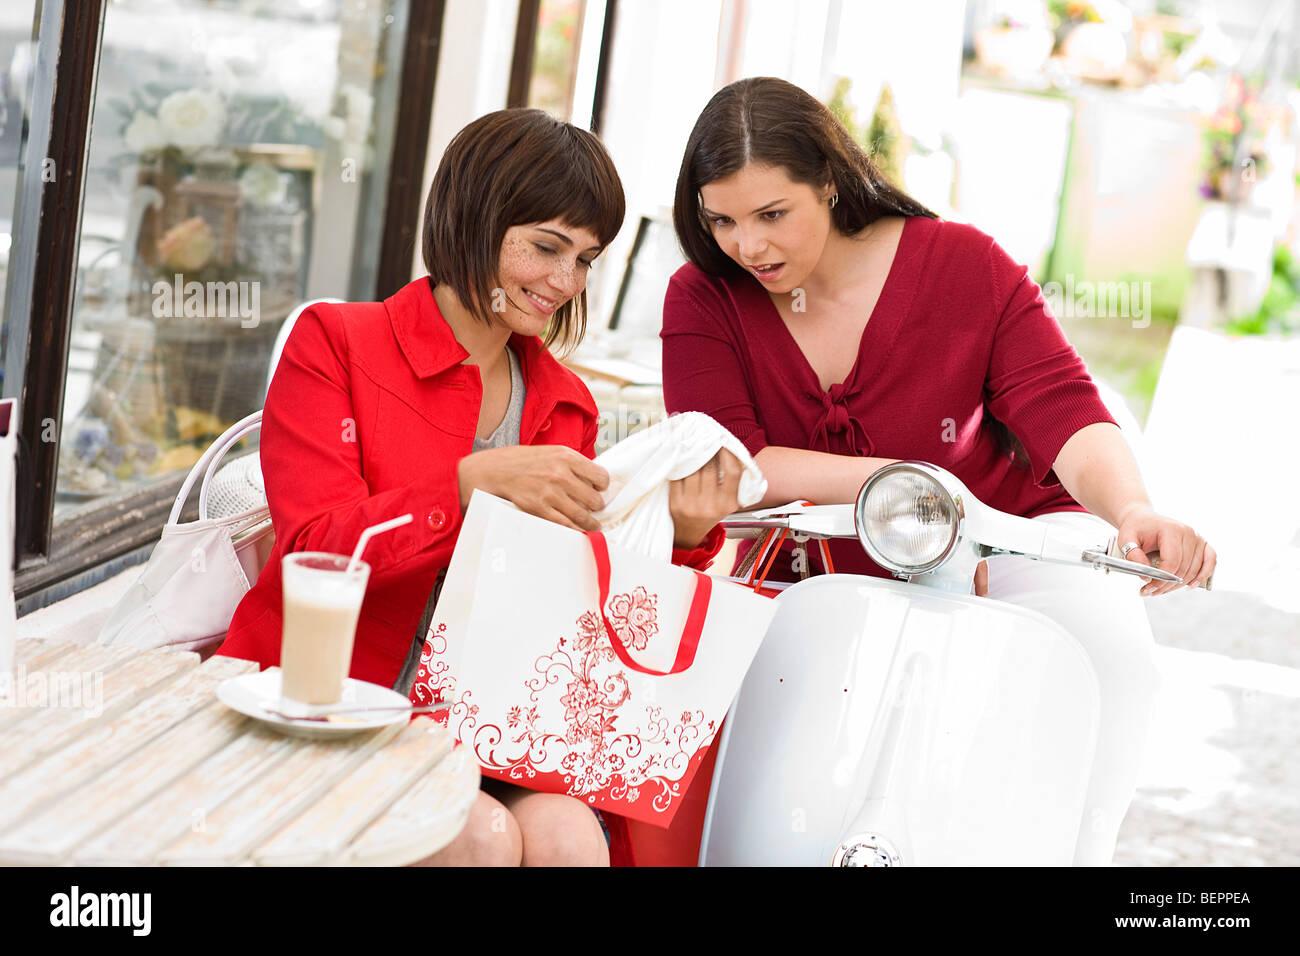 girlfriends meet in a street cafe - Stock Image